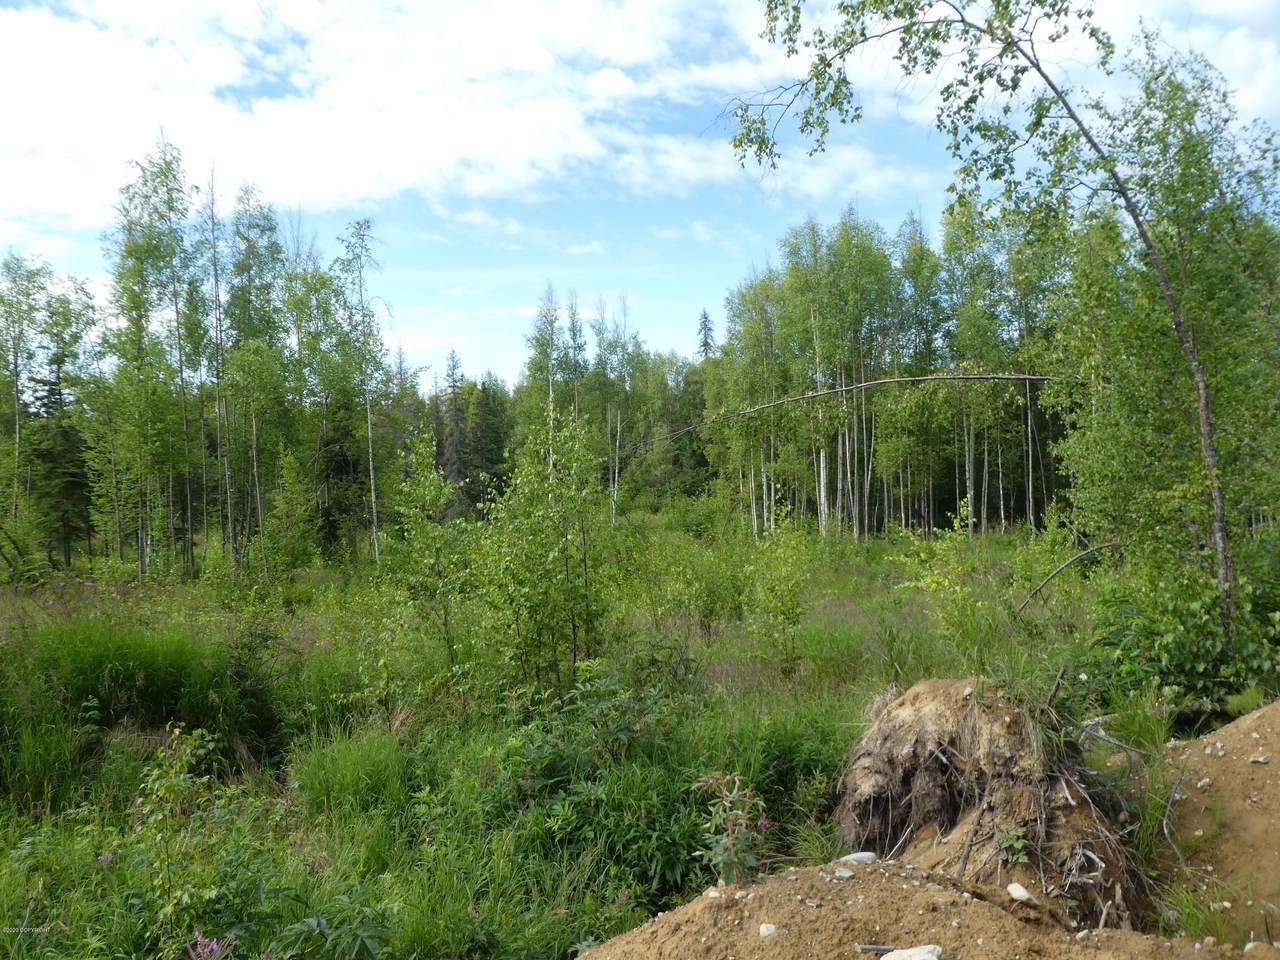 https://bt-photos.global.ssl.fastly.net/alaska/1280_boomver_2_20-10455-2.jpg